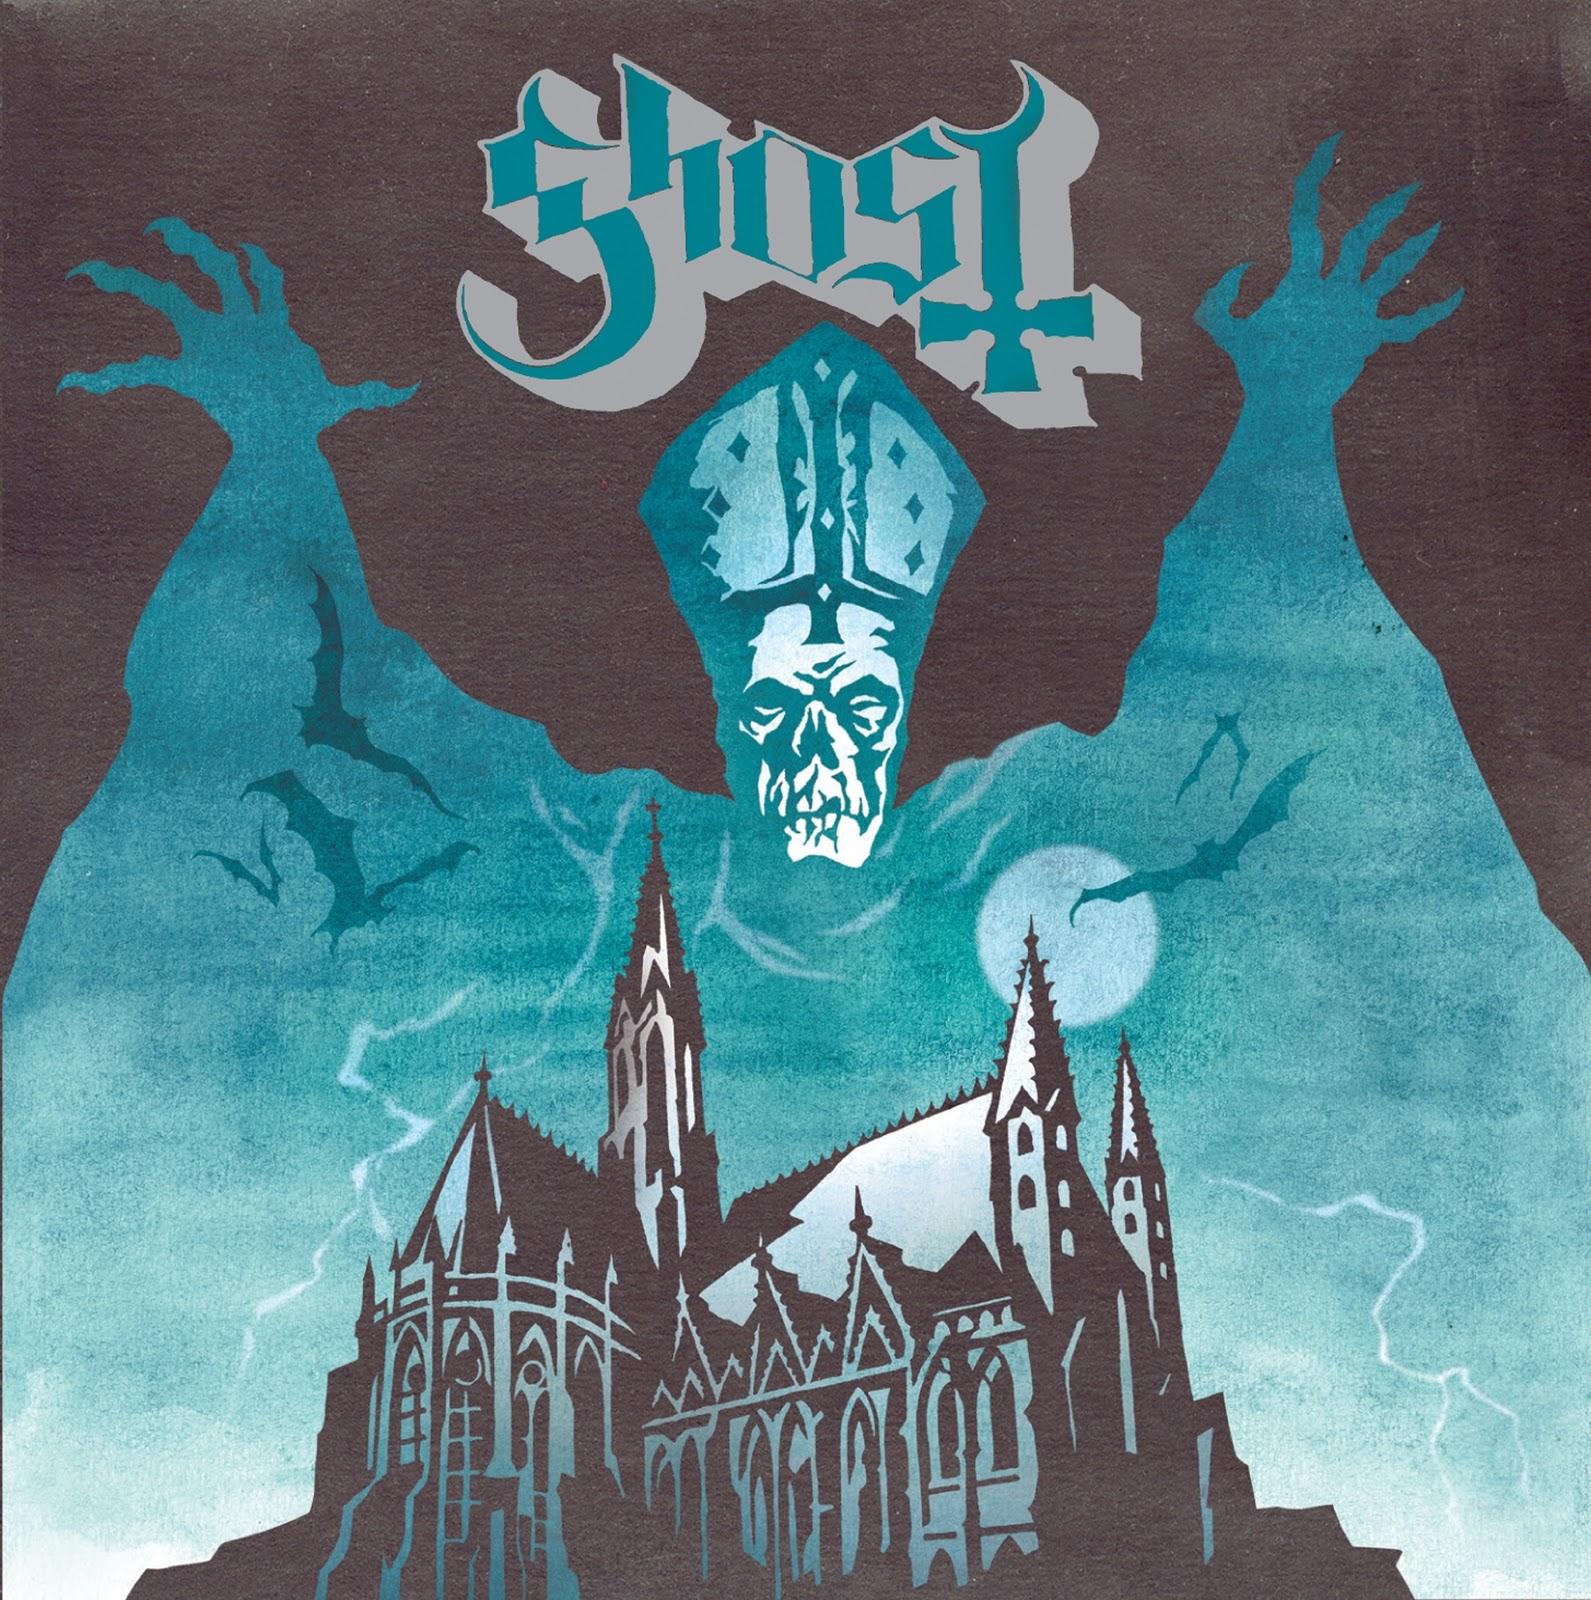 http://3.bp.blogspot.com/-SKu-HcpH-1g/UNZDRcf7xCI/AAAAAAAAF7M/EqOmZ4BtAm8/s1600/ghost+opus+eponymous.jpg